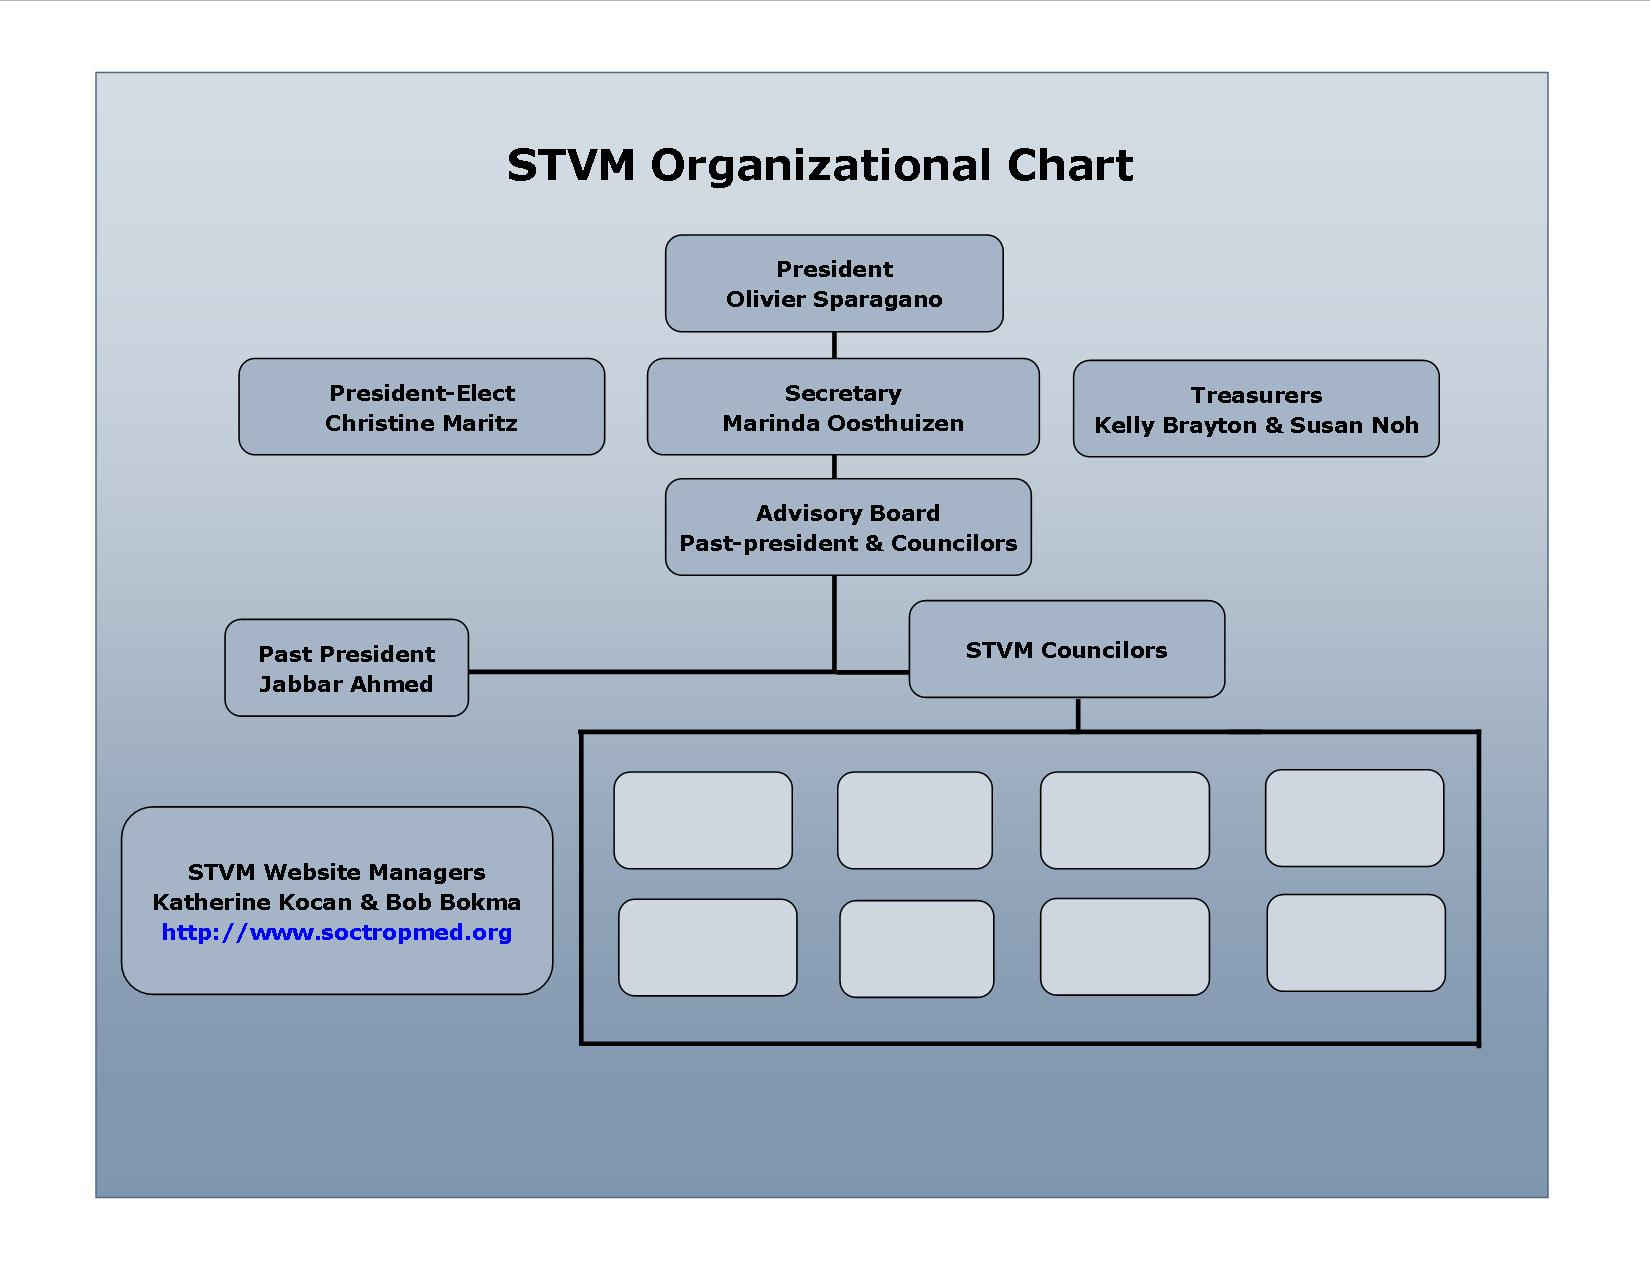 STVM organizational chart 2015